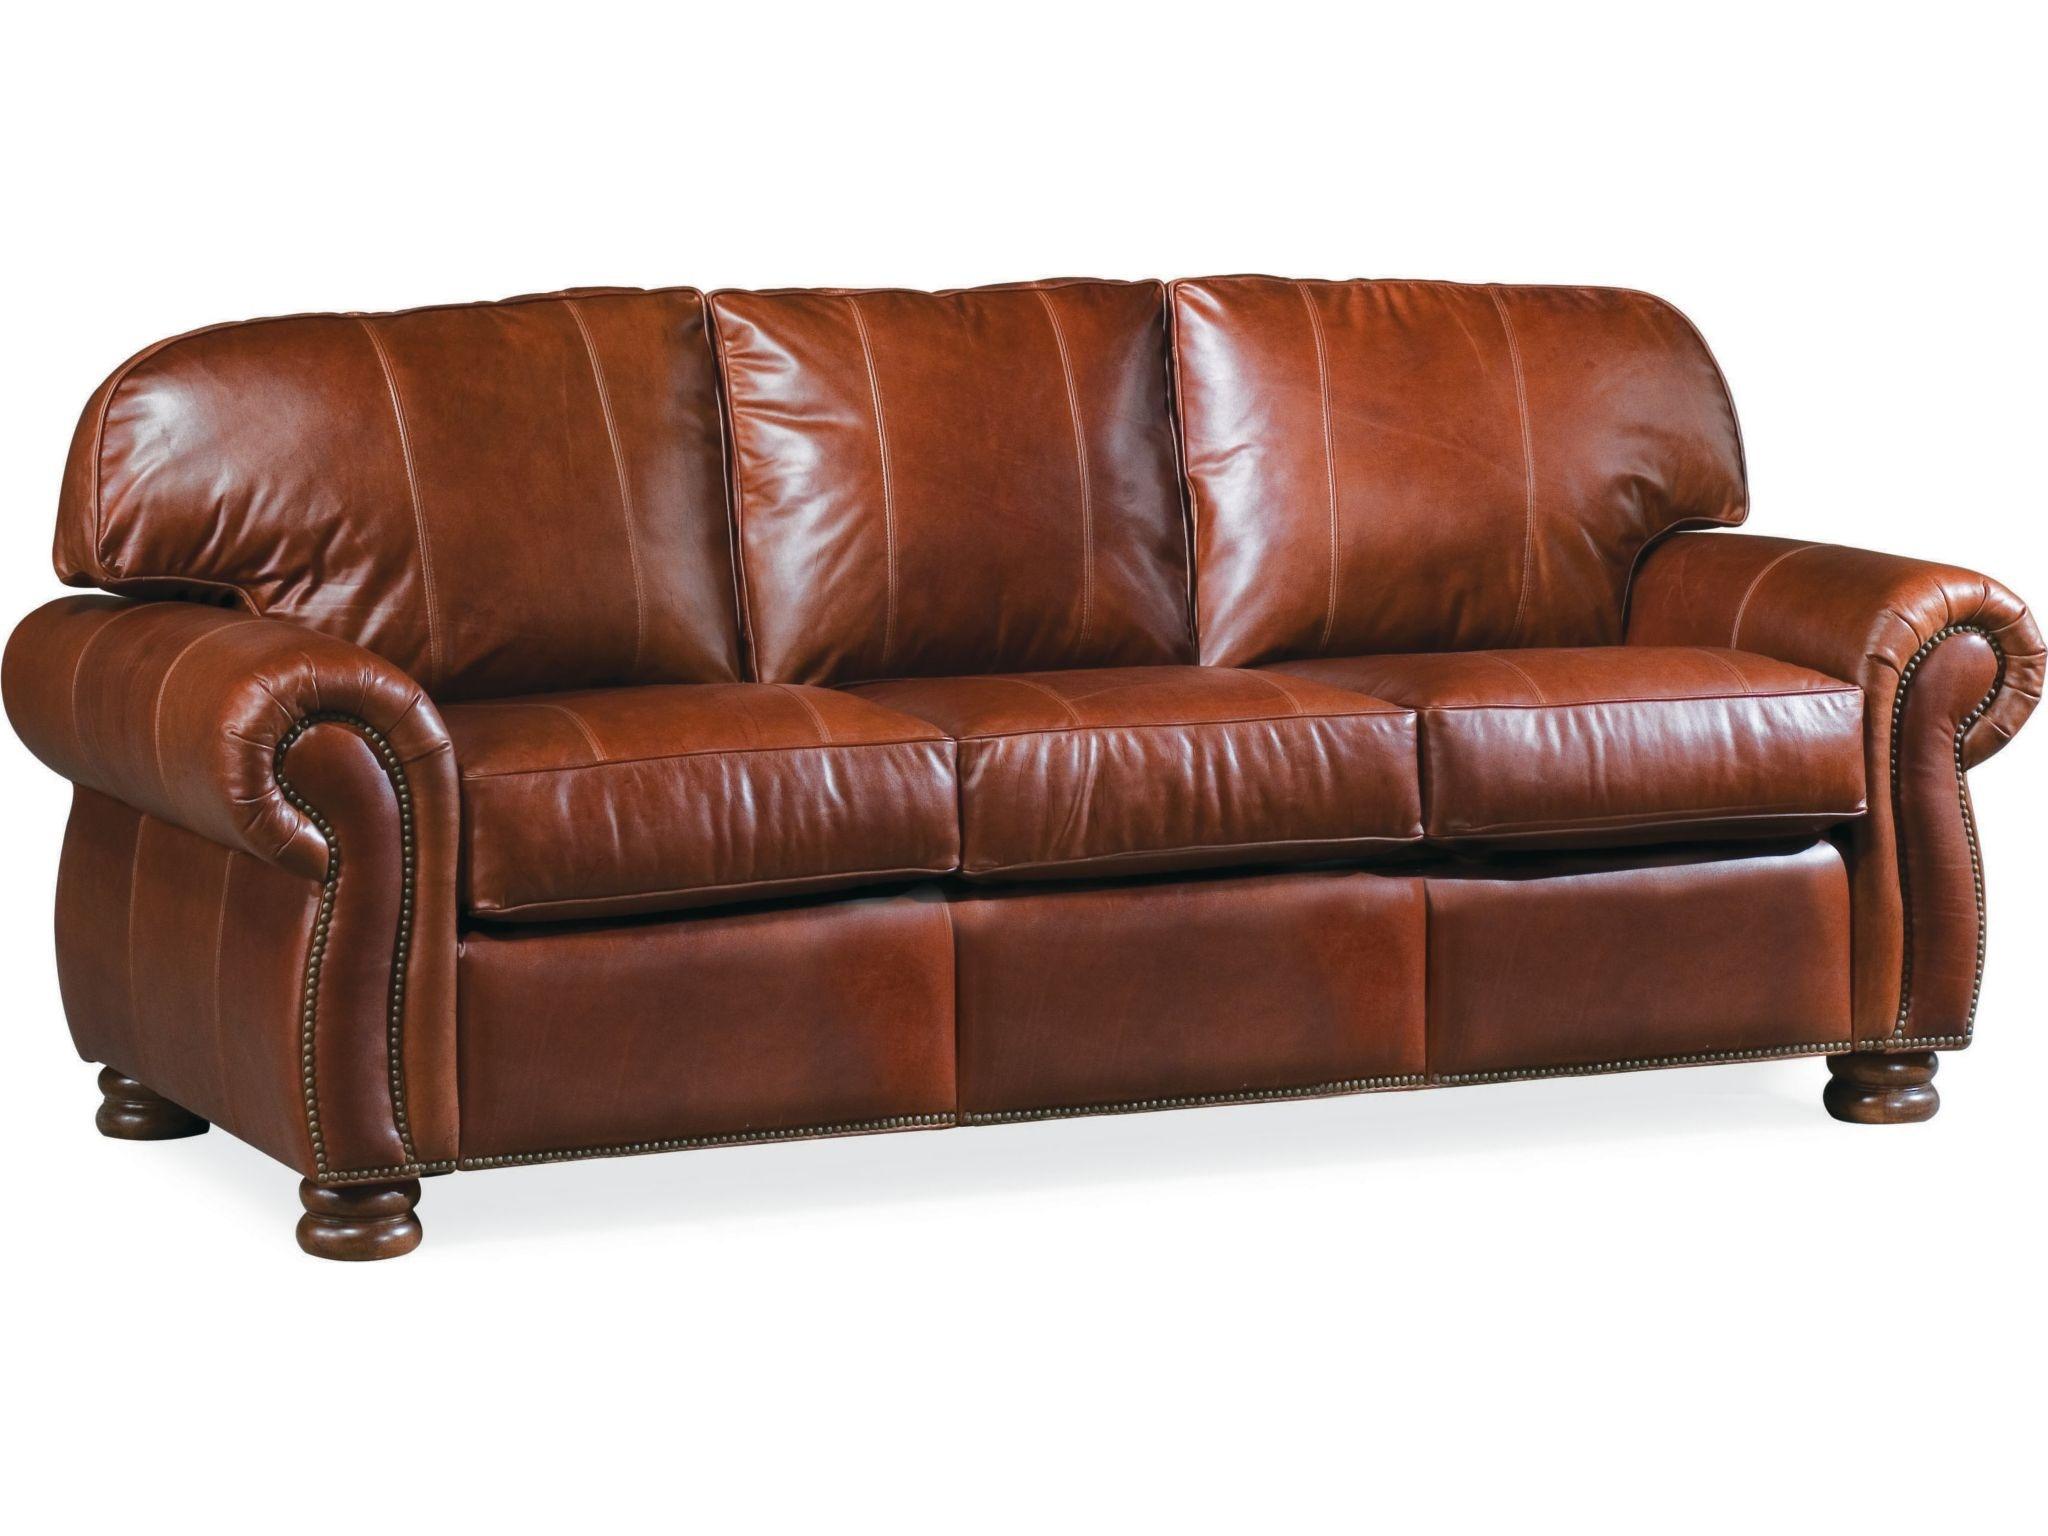 thomasville benjamin sofa city furniture set living room motion 3 seat